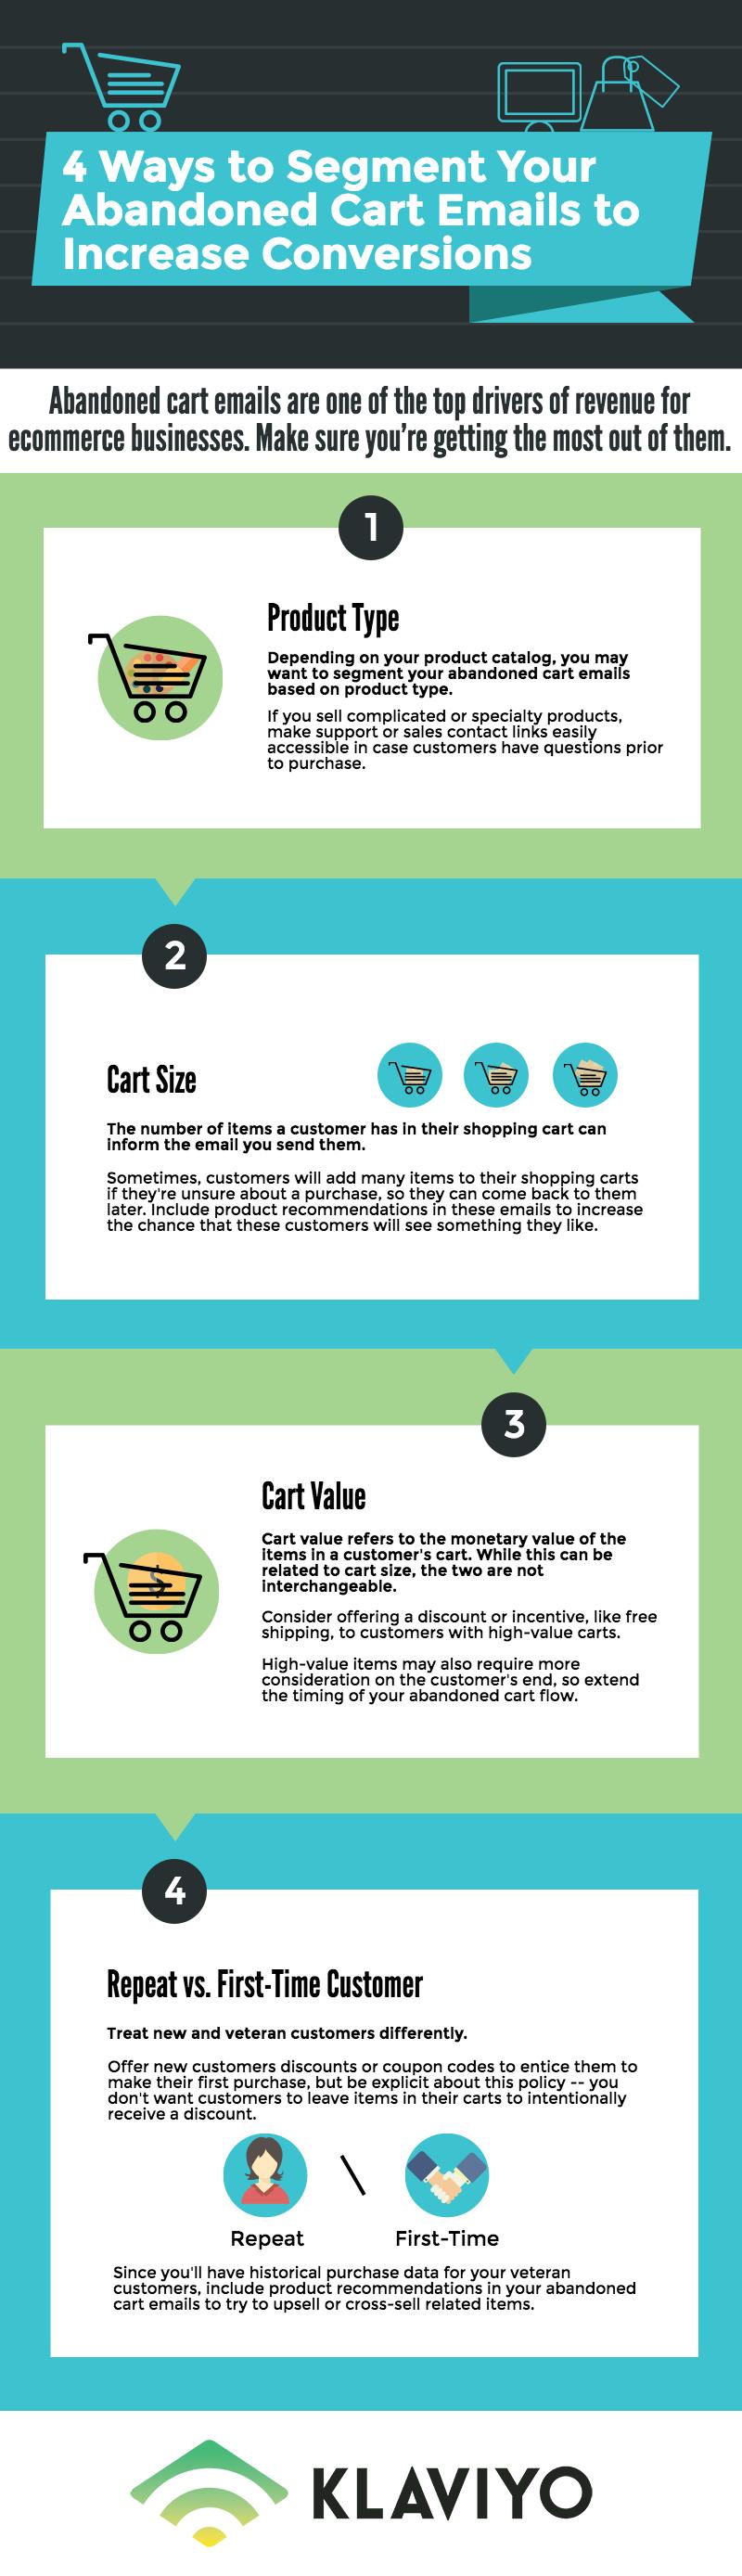 4 Ways To Segment Your Abandoned Cart Emails Infographic Klaviyo Blog Email Marketing Inspiration Segmentation Infographic